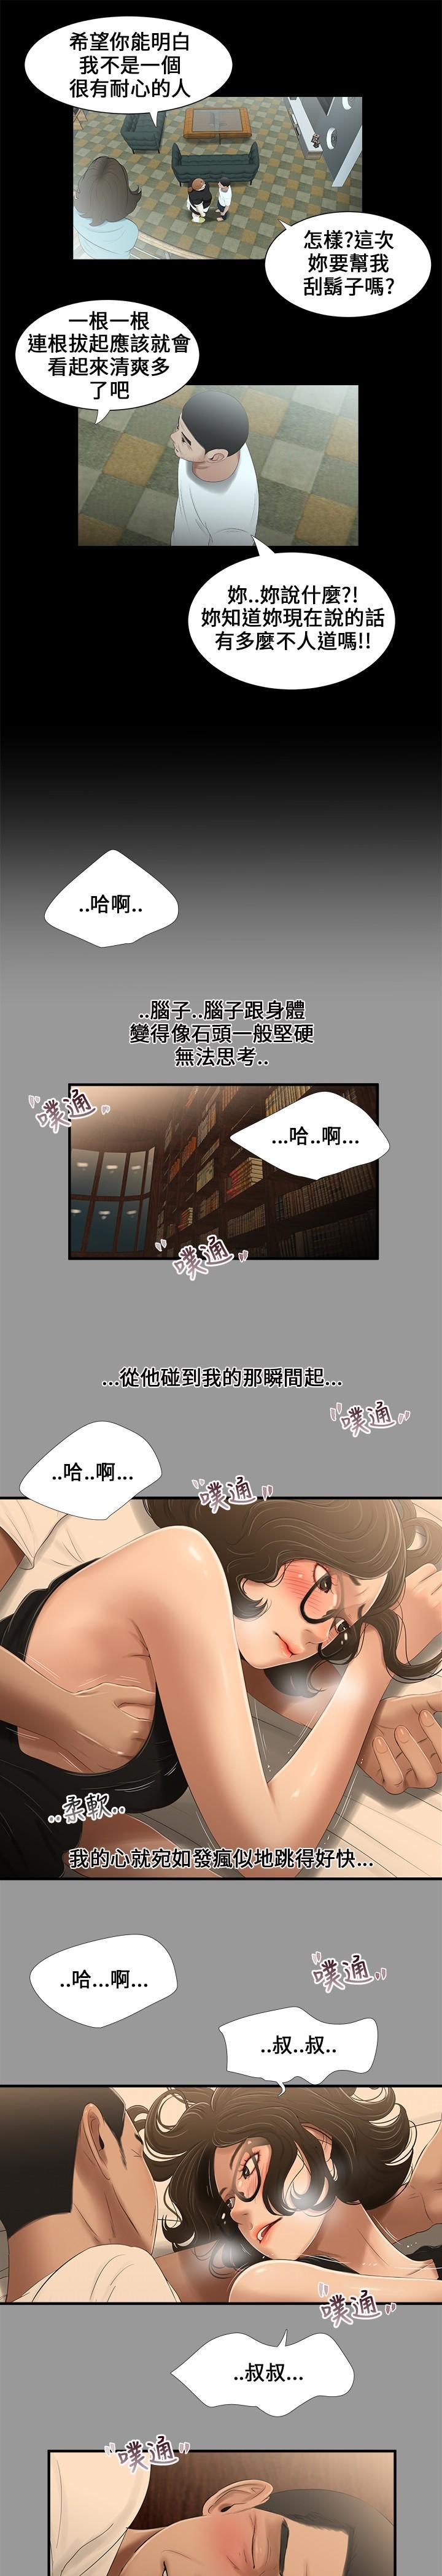 Three sisters 三姐妹Ch.13~19 (Chinese)中文 52